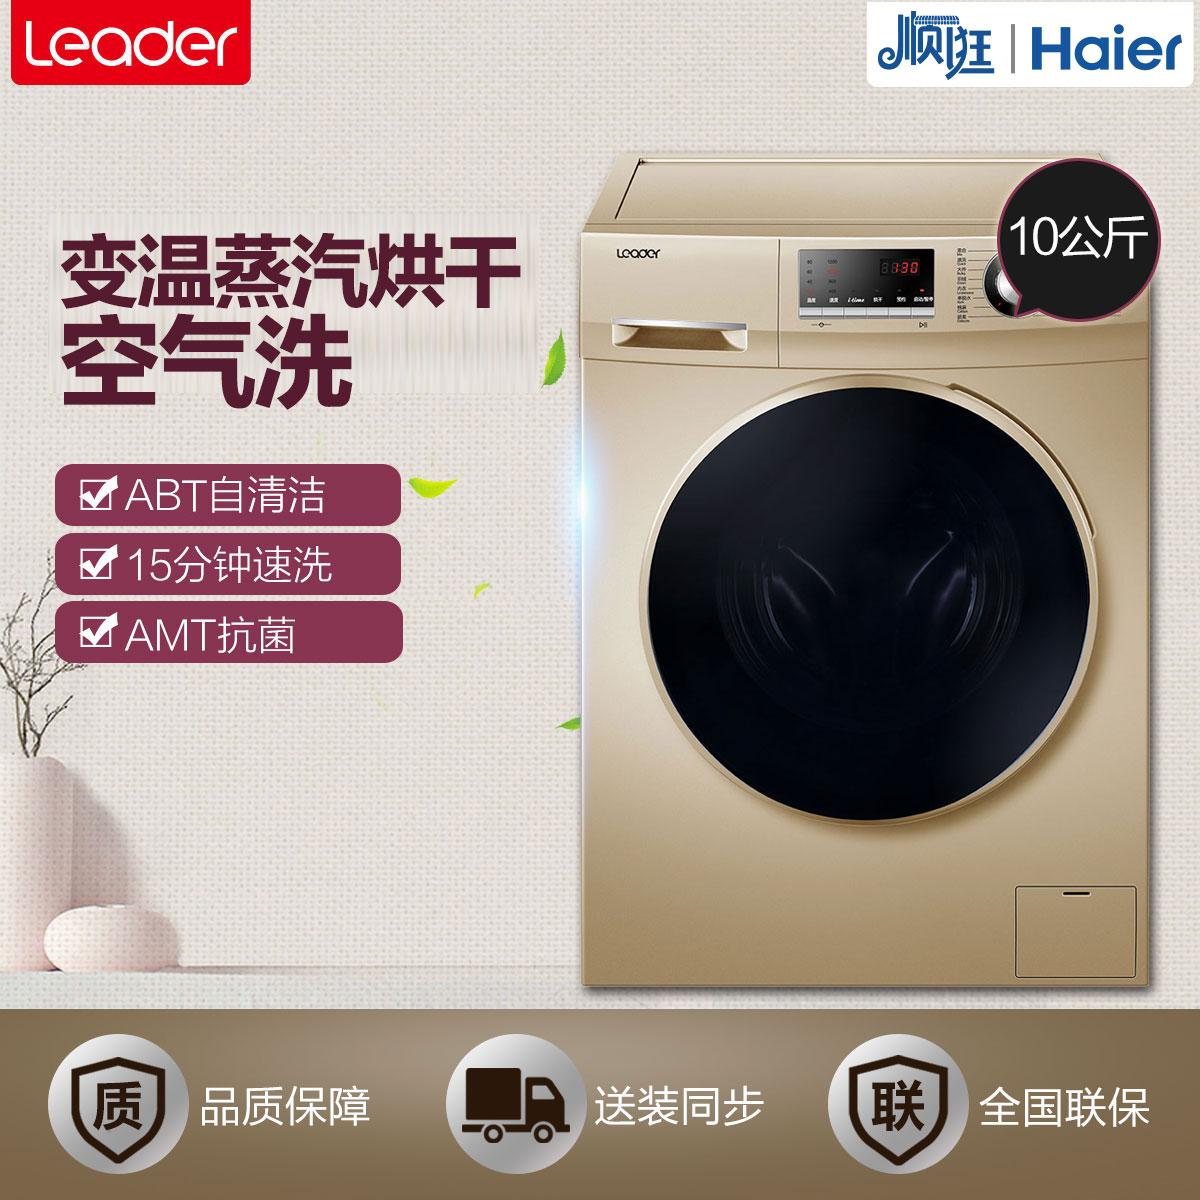 10kg大容量 洗烘一体 空气洗 @G1014HBX66G 10公斤洗烘一体变频滚筒洗衣机